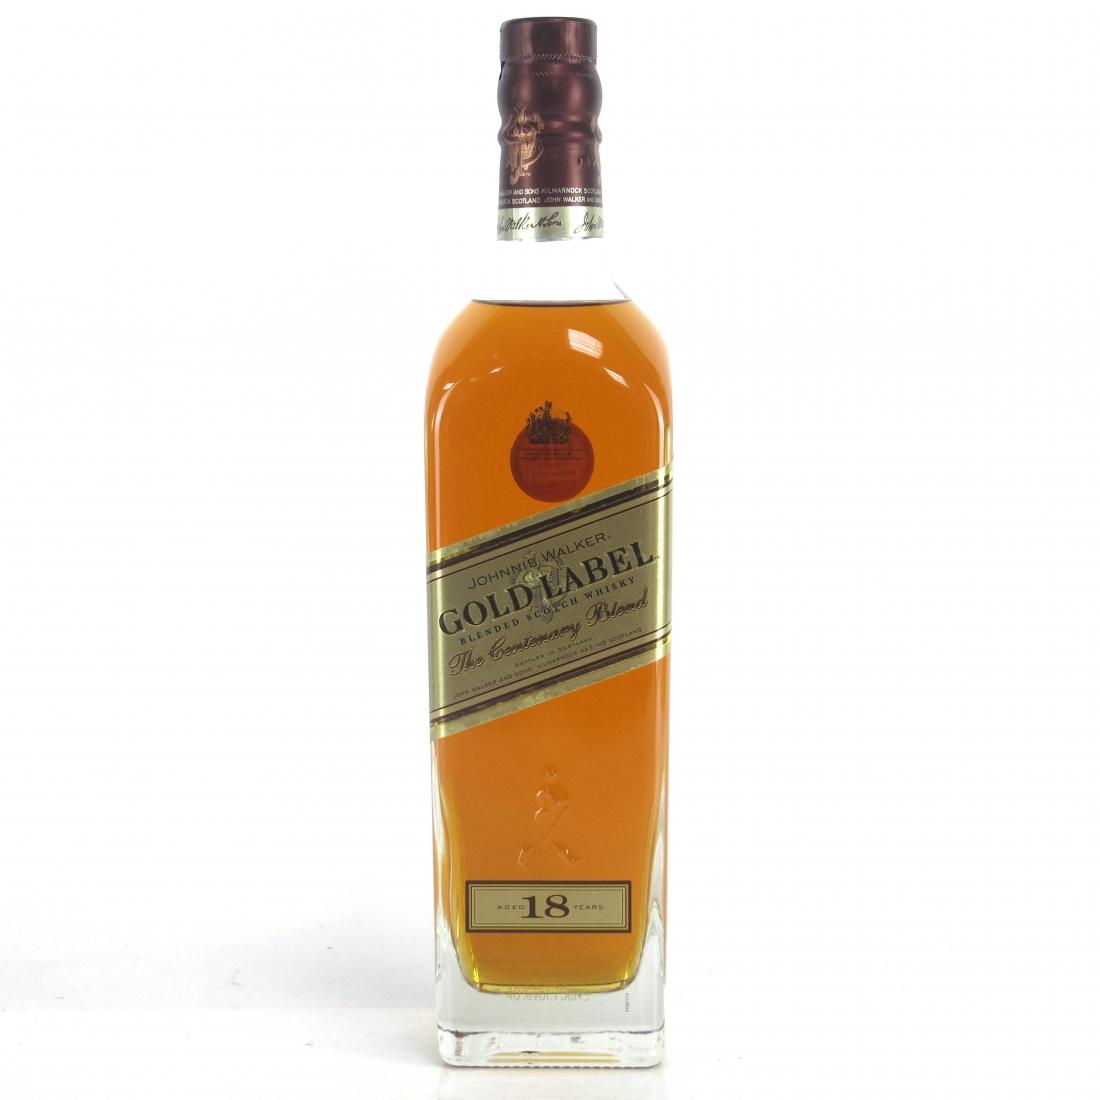 Johnnie Walker Gold Label 18 Year Old / Centenary Blend